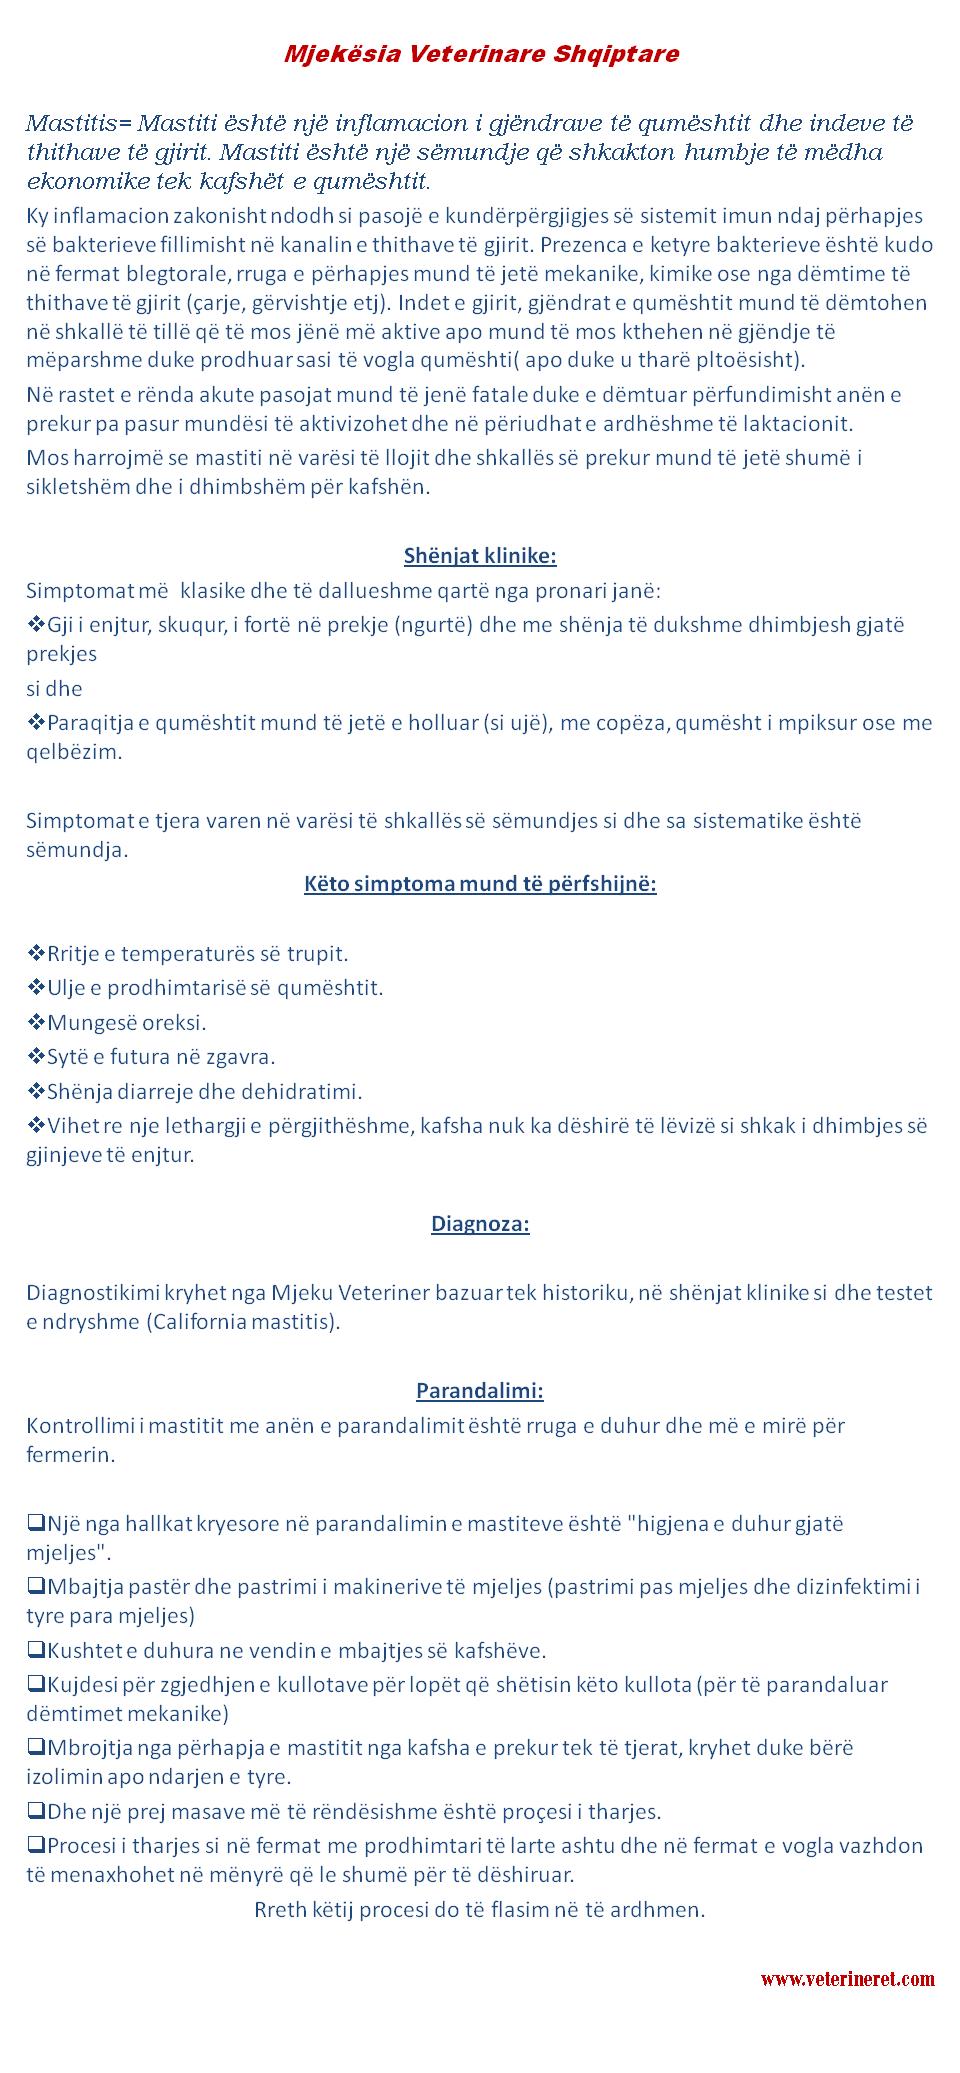 Mastitis-Mastiti tek kafshet blegtorale